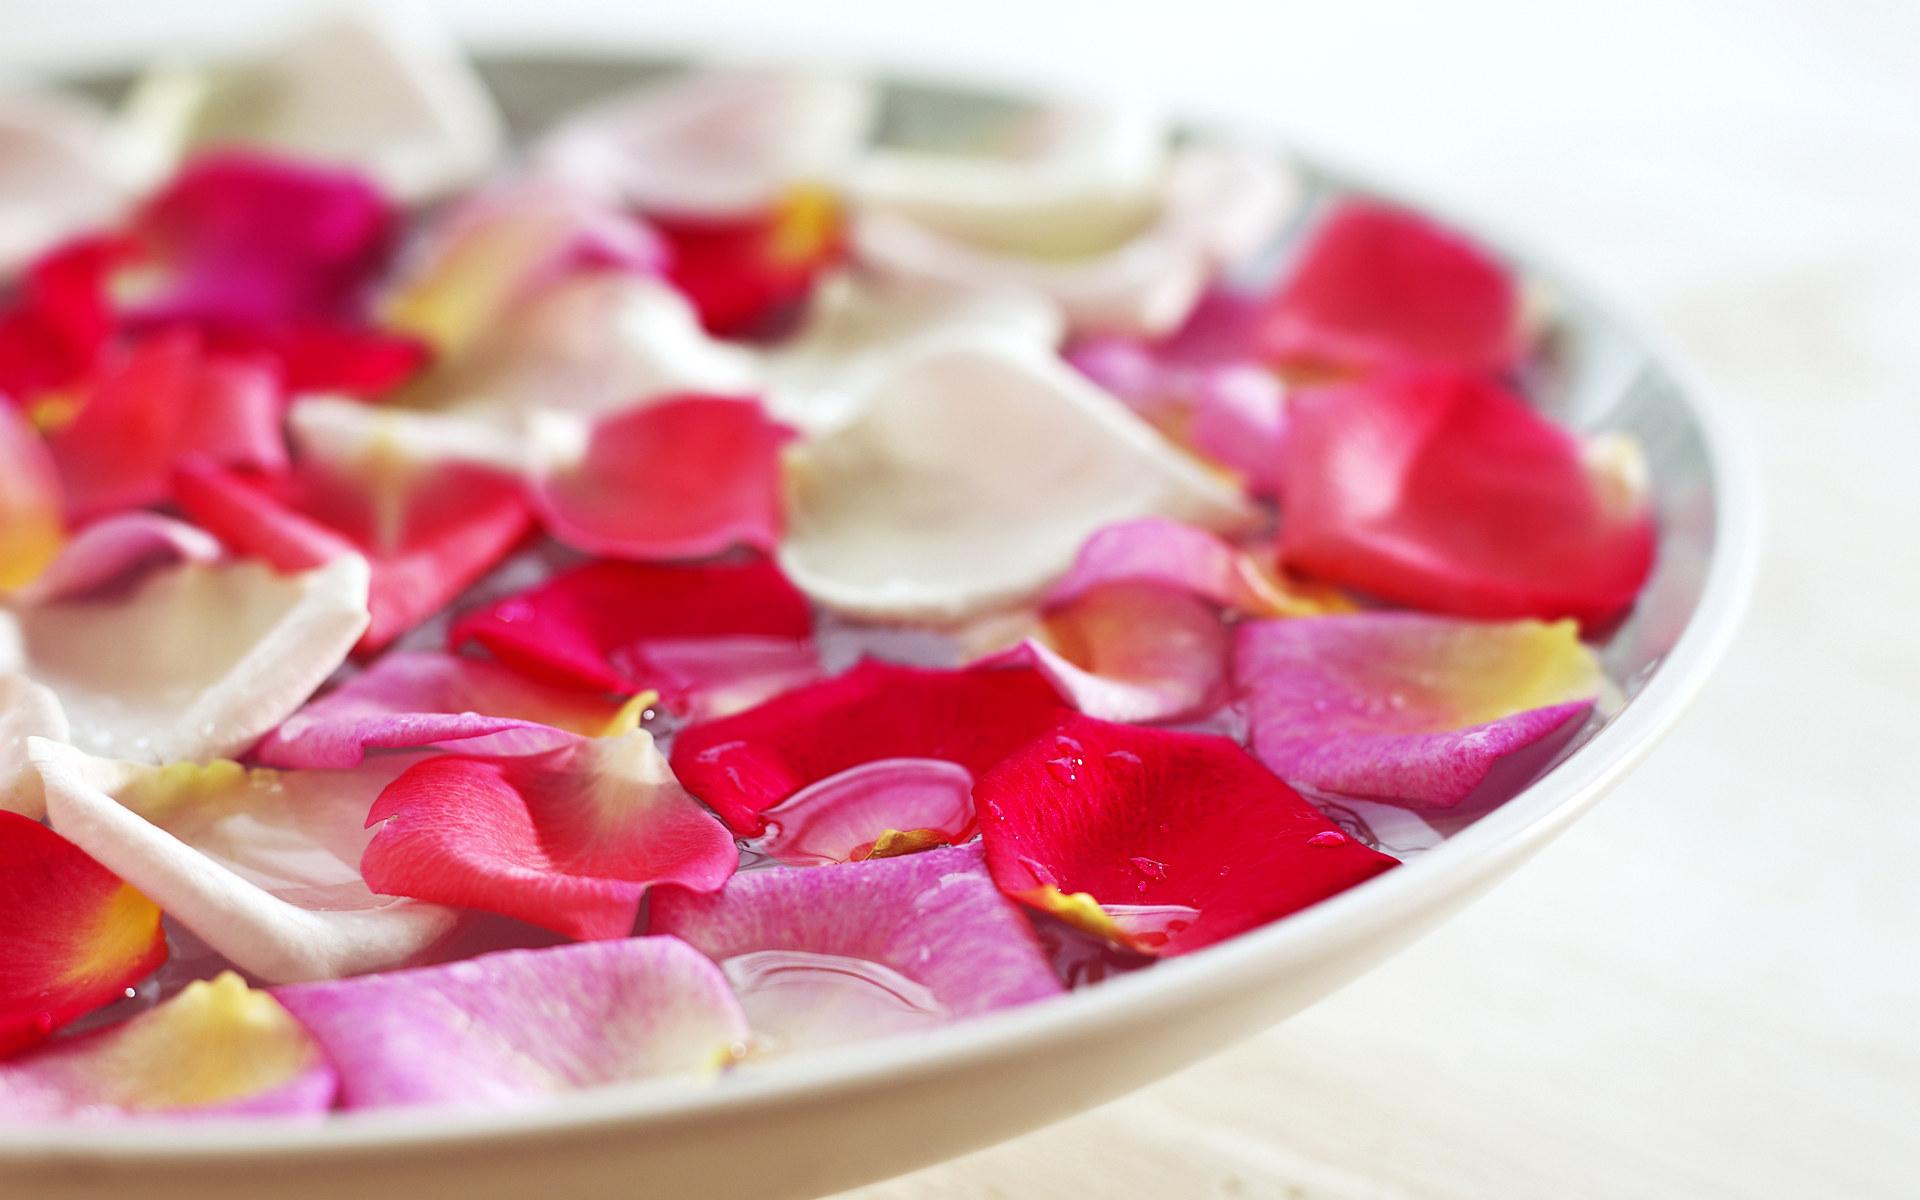 Spa Beauty treatments SPA therapy 1920x1200 Wallpaper 7   Wallcoonet 1920x1200